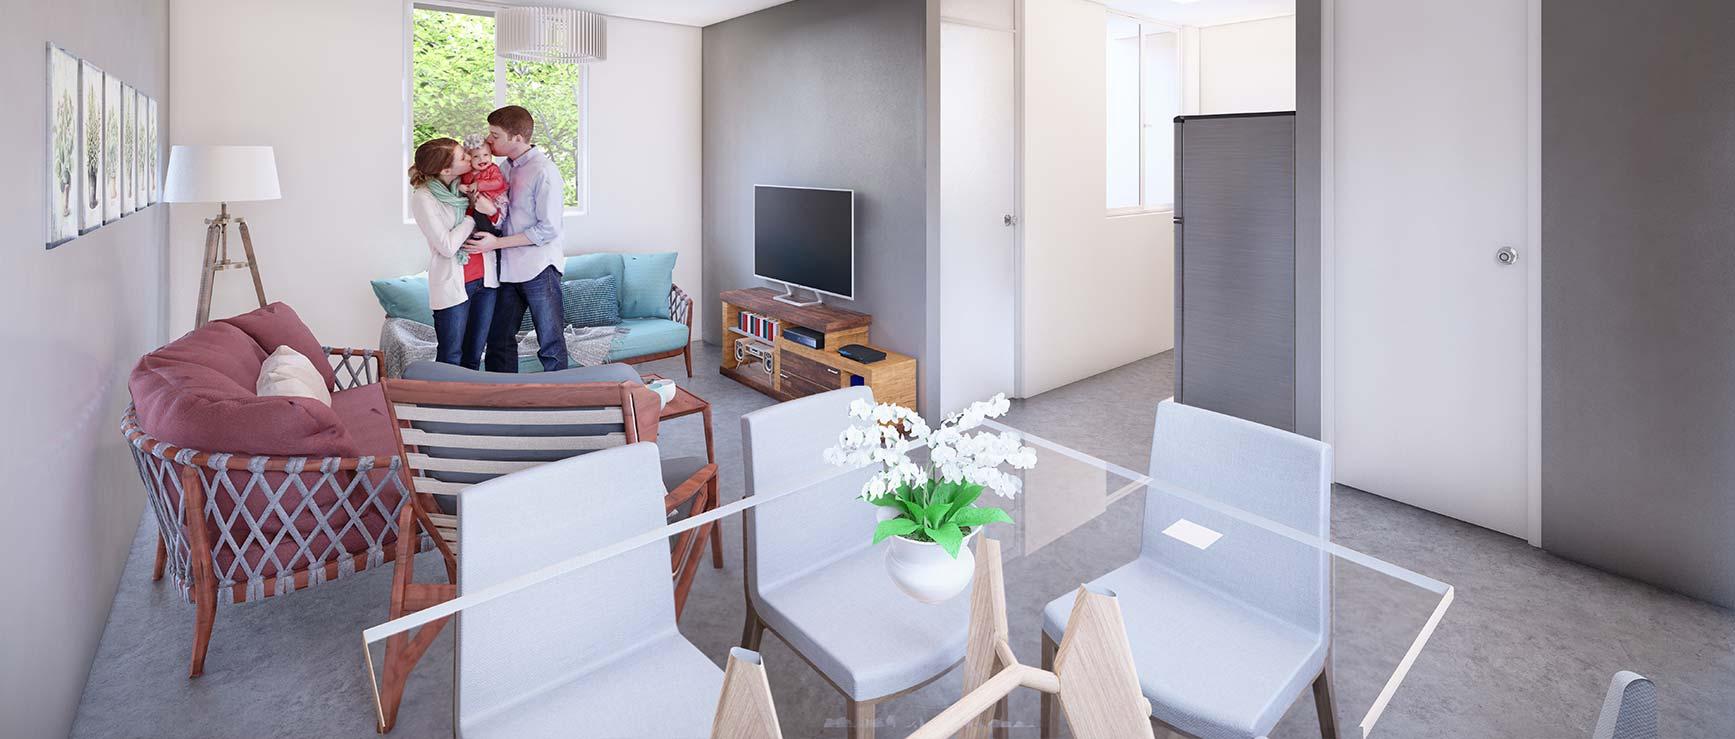 tira-imagenes-residencial-oasis-sullana-4